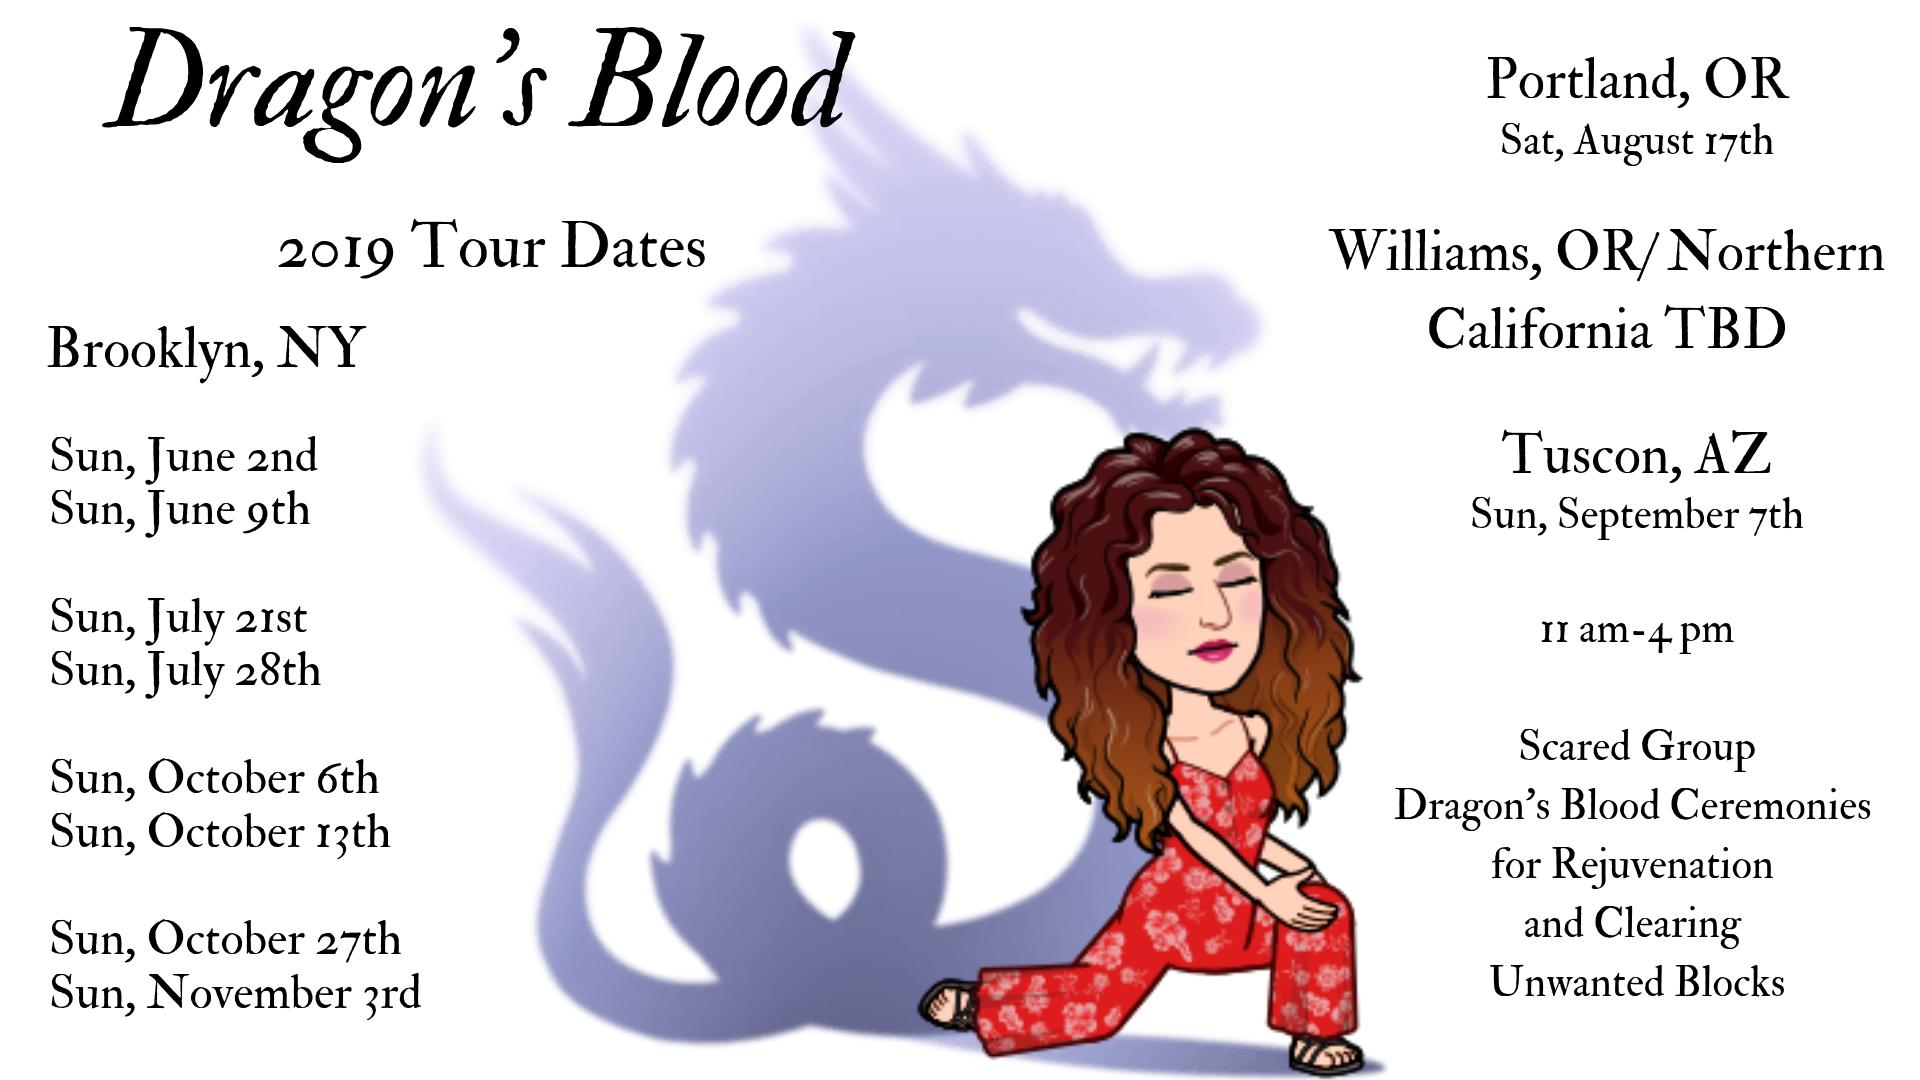 Dragon's Blood 2019 Tour Dates.png